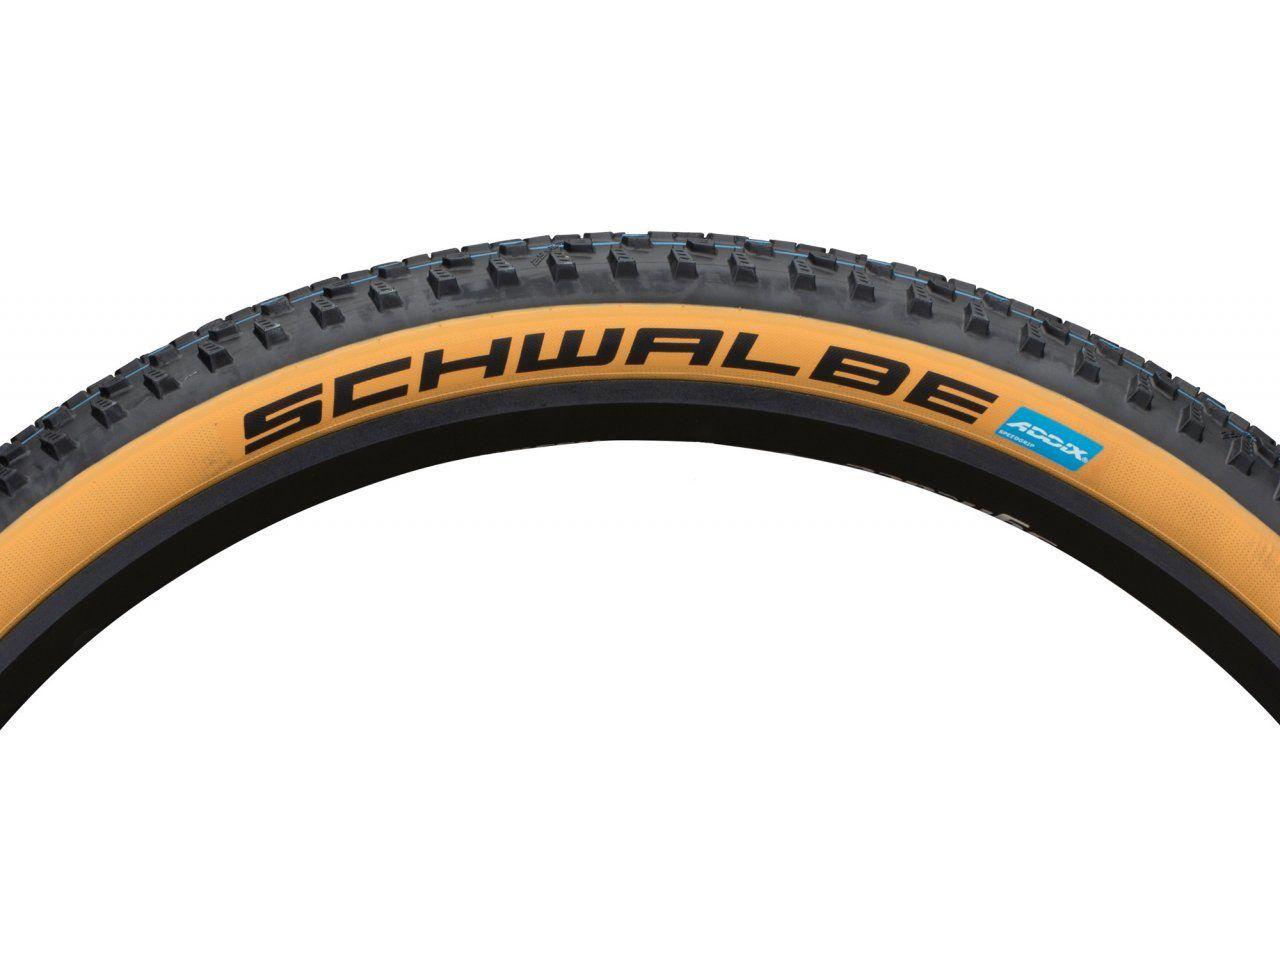 Pneu Schwalbe Racing Ray Evo Snakeskin Addix 29x2.25 Novo